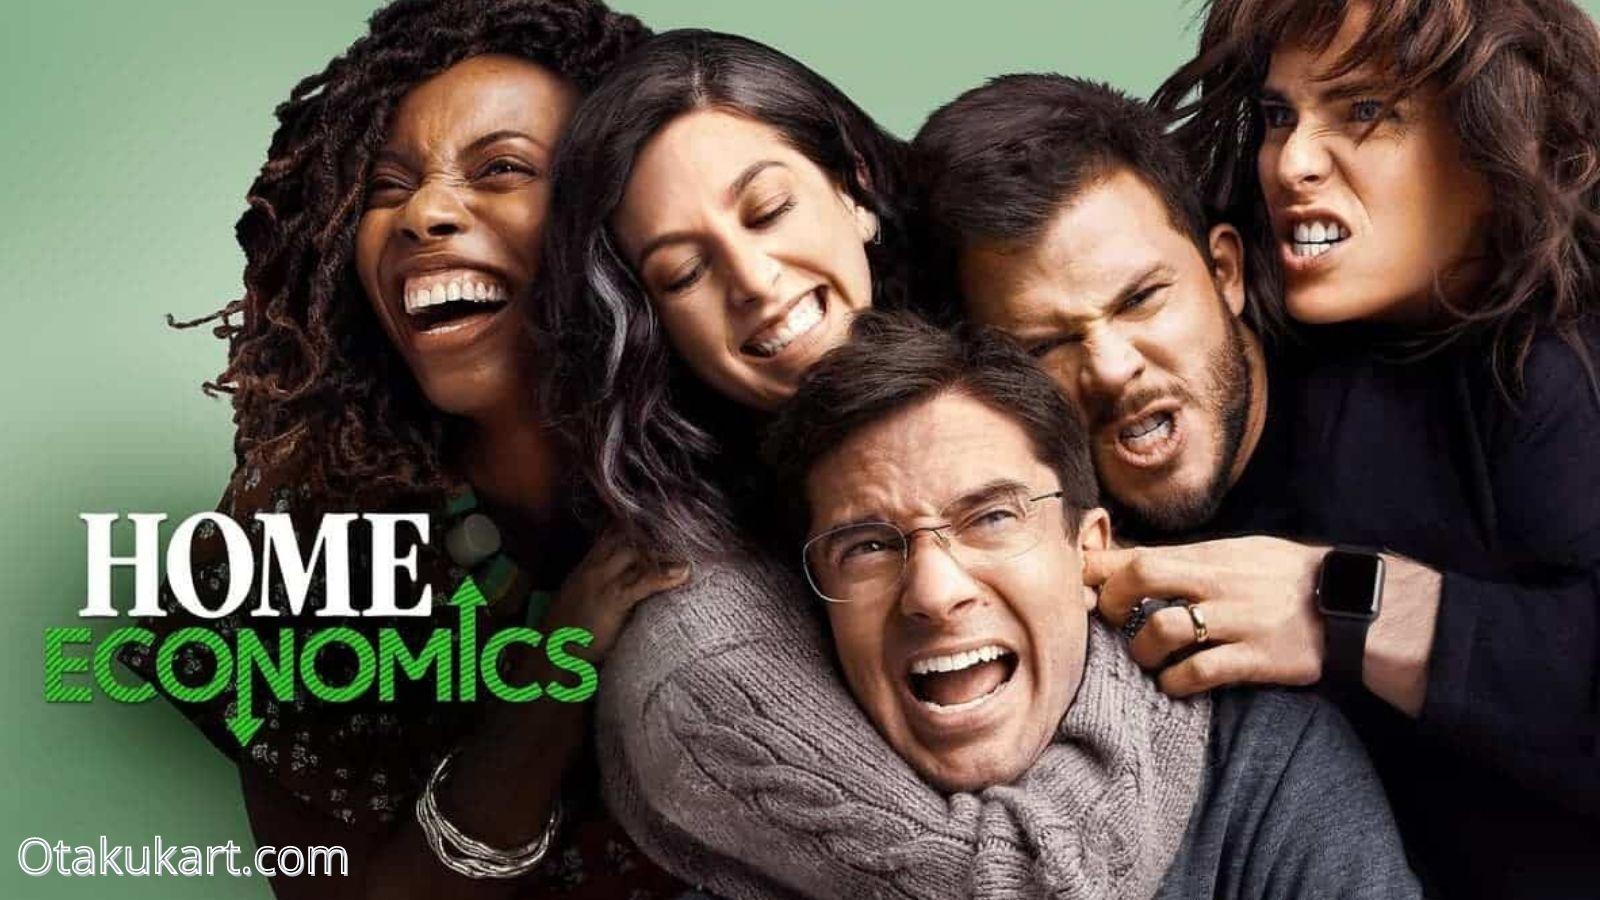 Home Economics Season 2